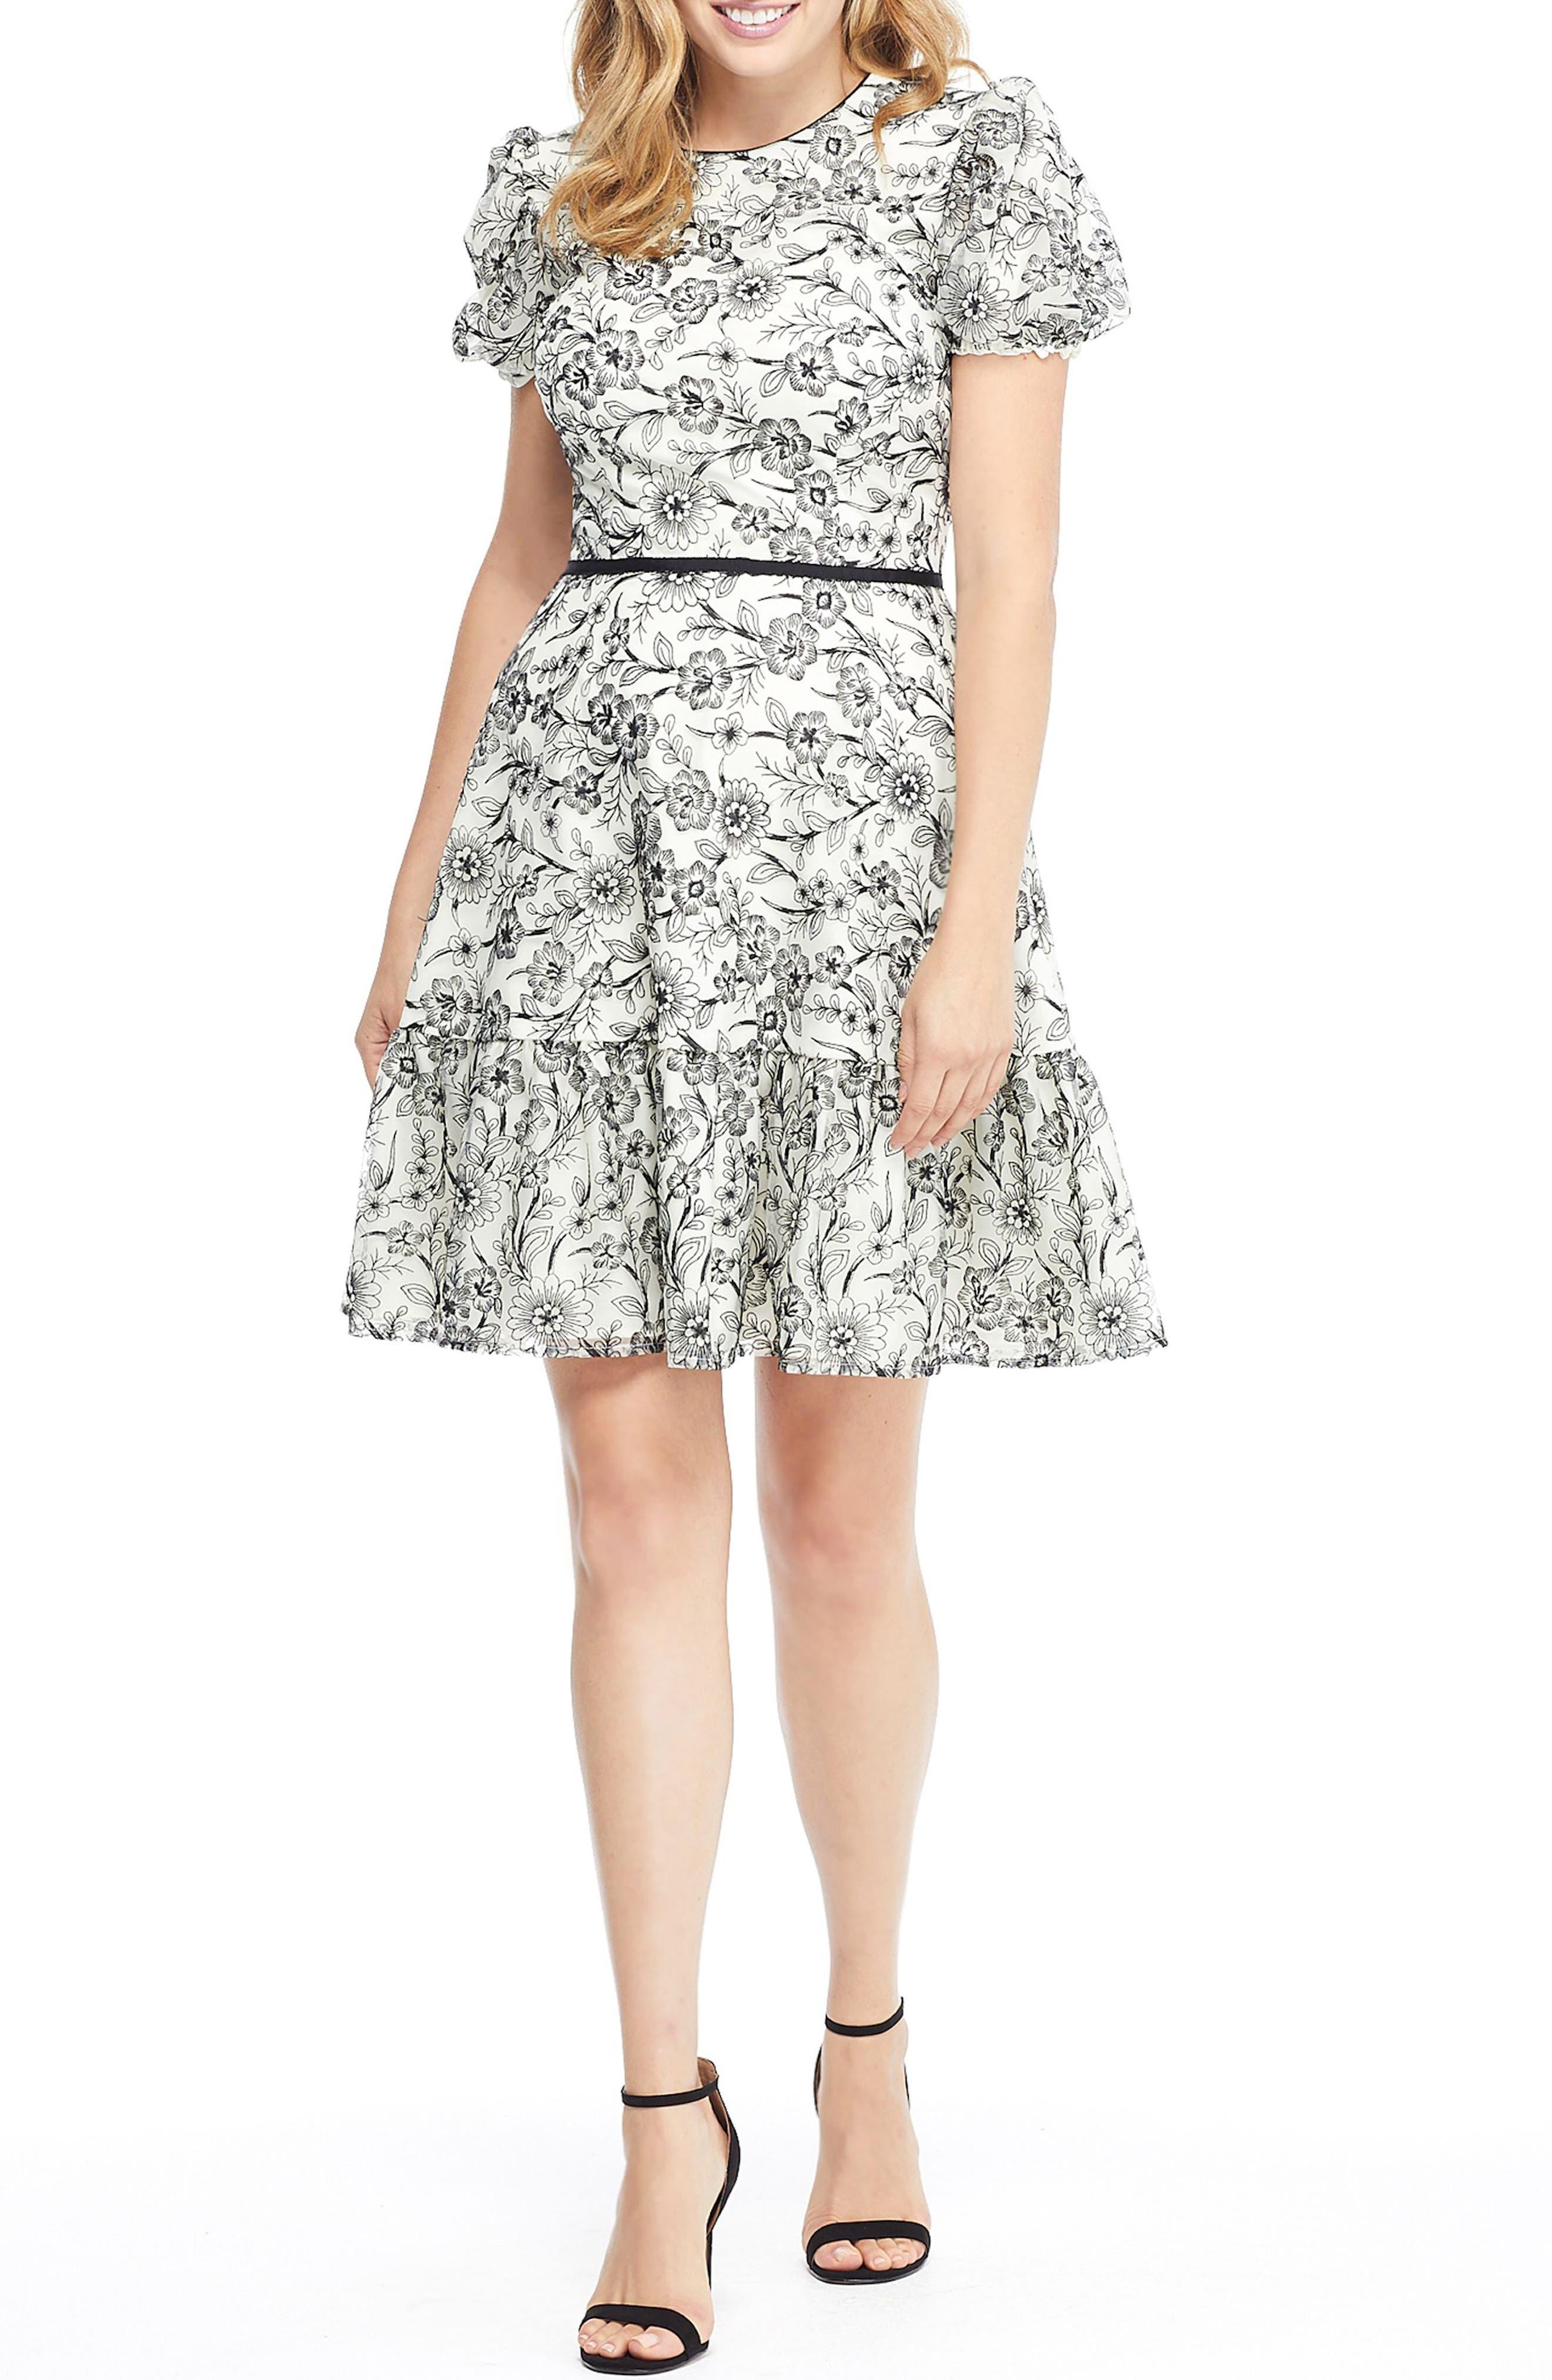 Viola Raffia Embroidery Pattern Dress,                             Main thumbnail 1, color,                             BLACK/ NUDE